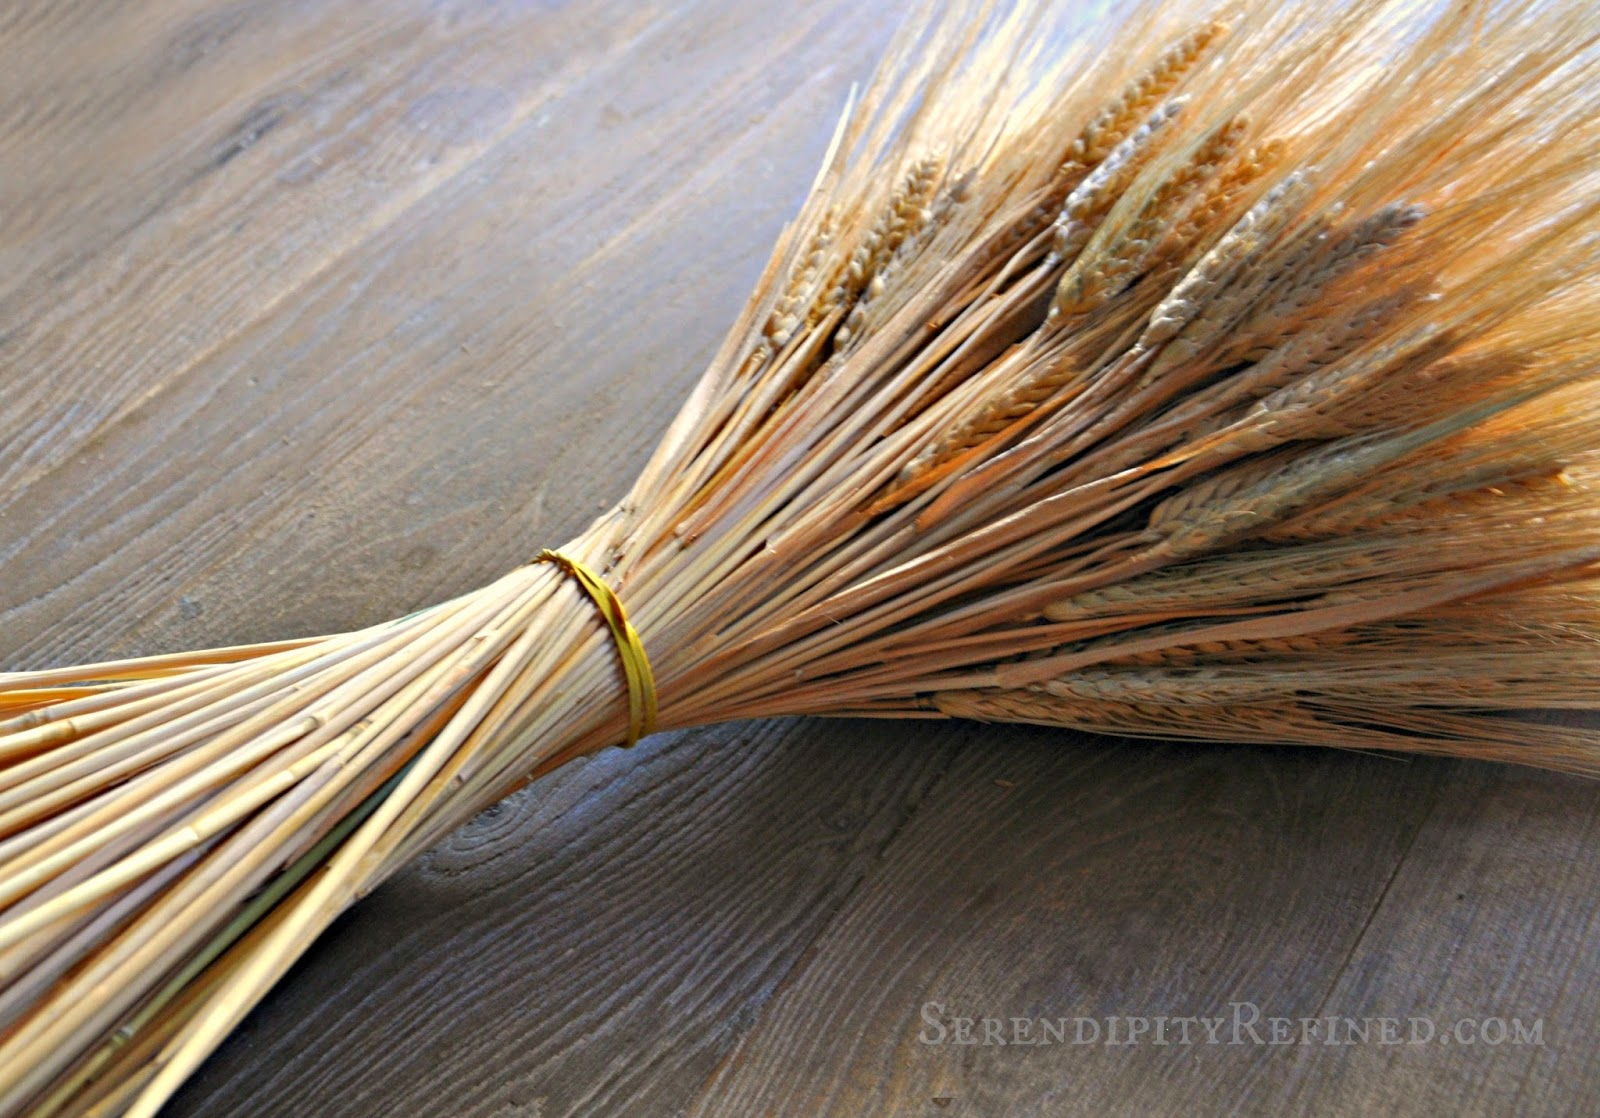 Serendipity Refined Blog Diy Fall Wheat Bundle Table